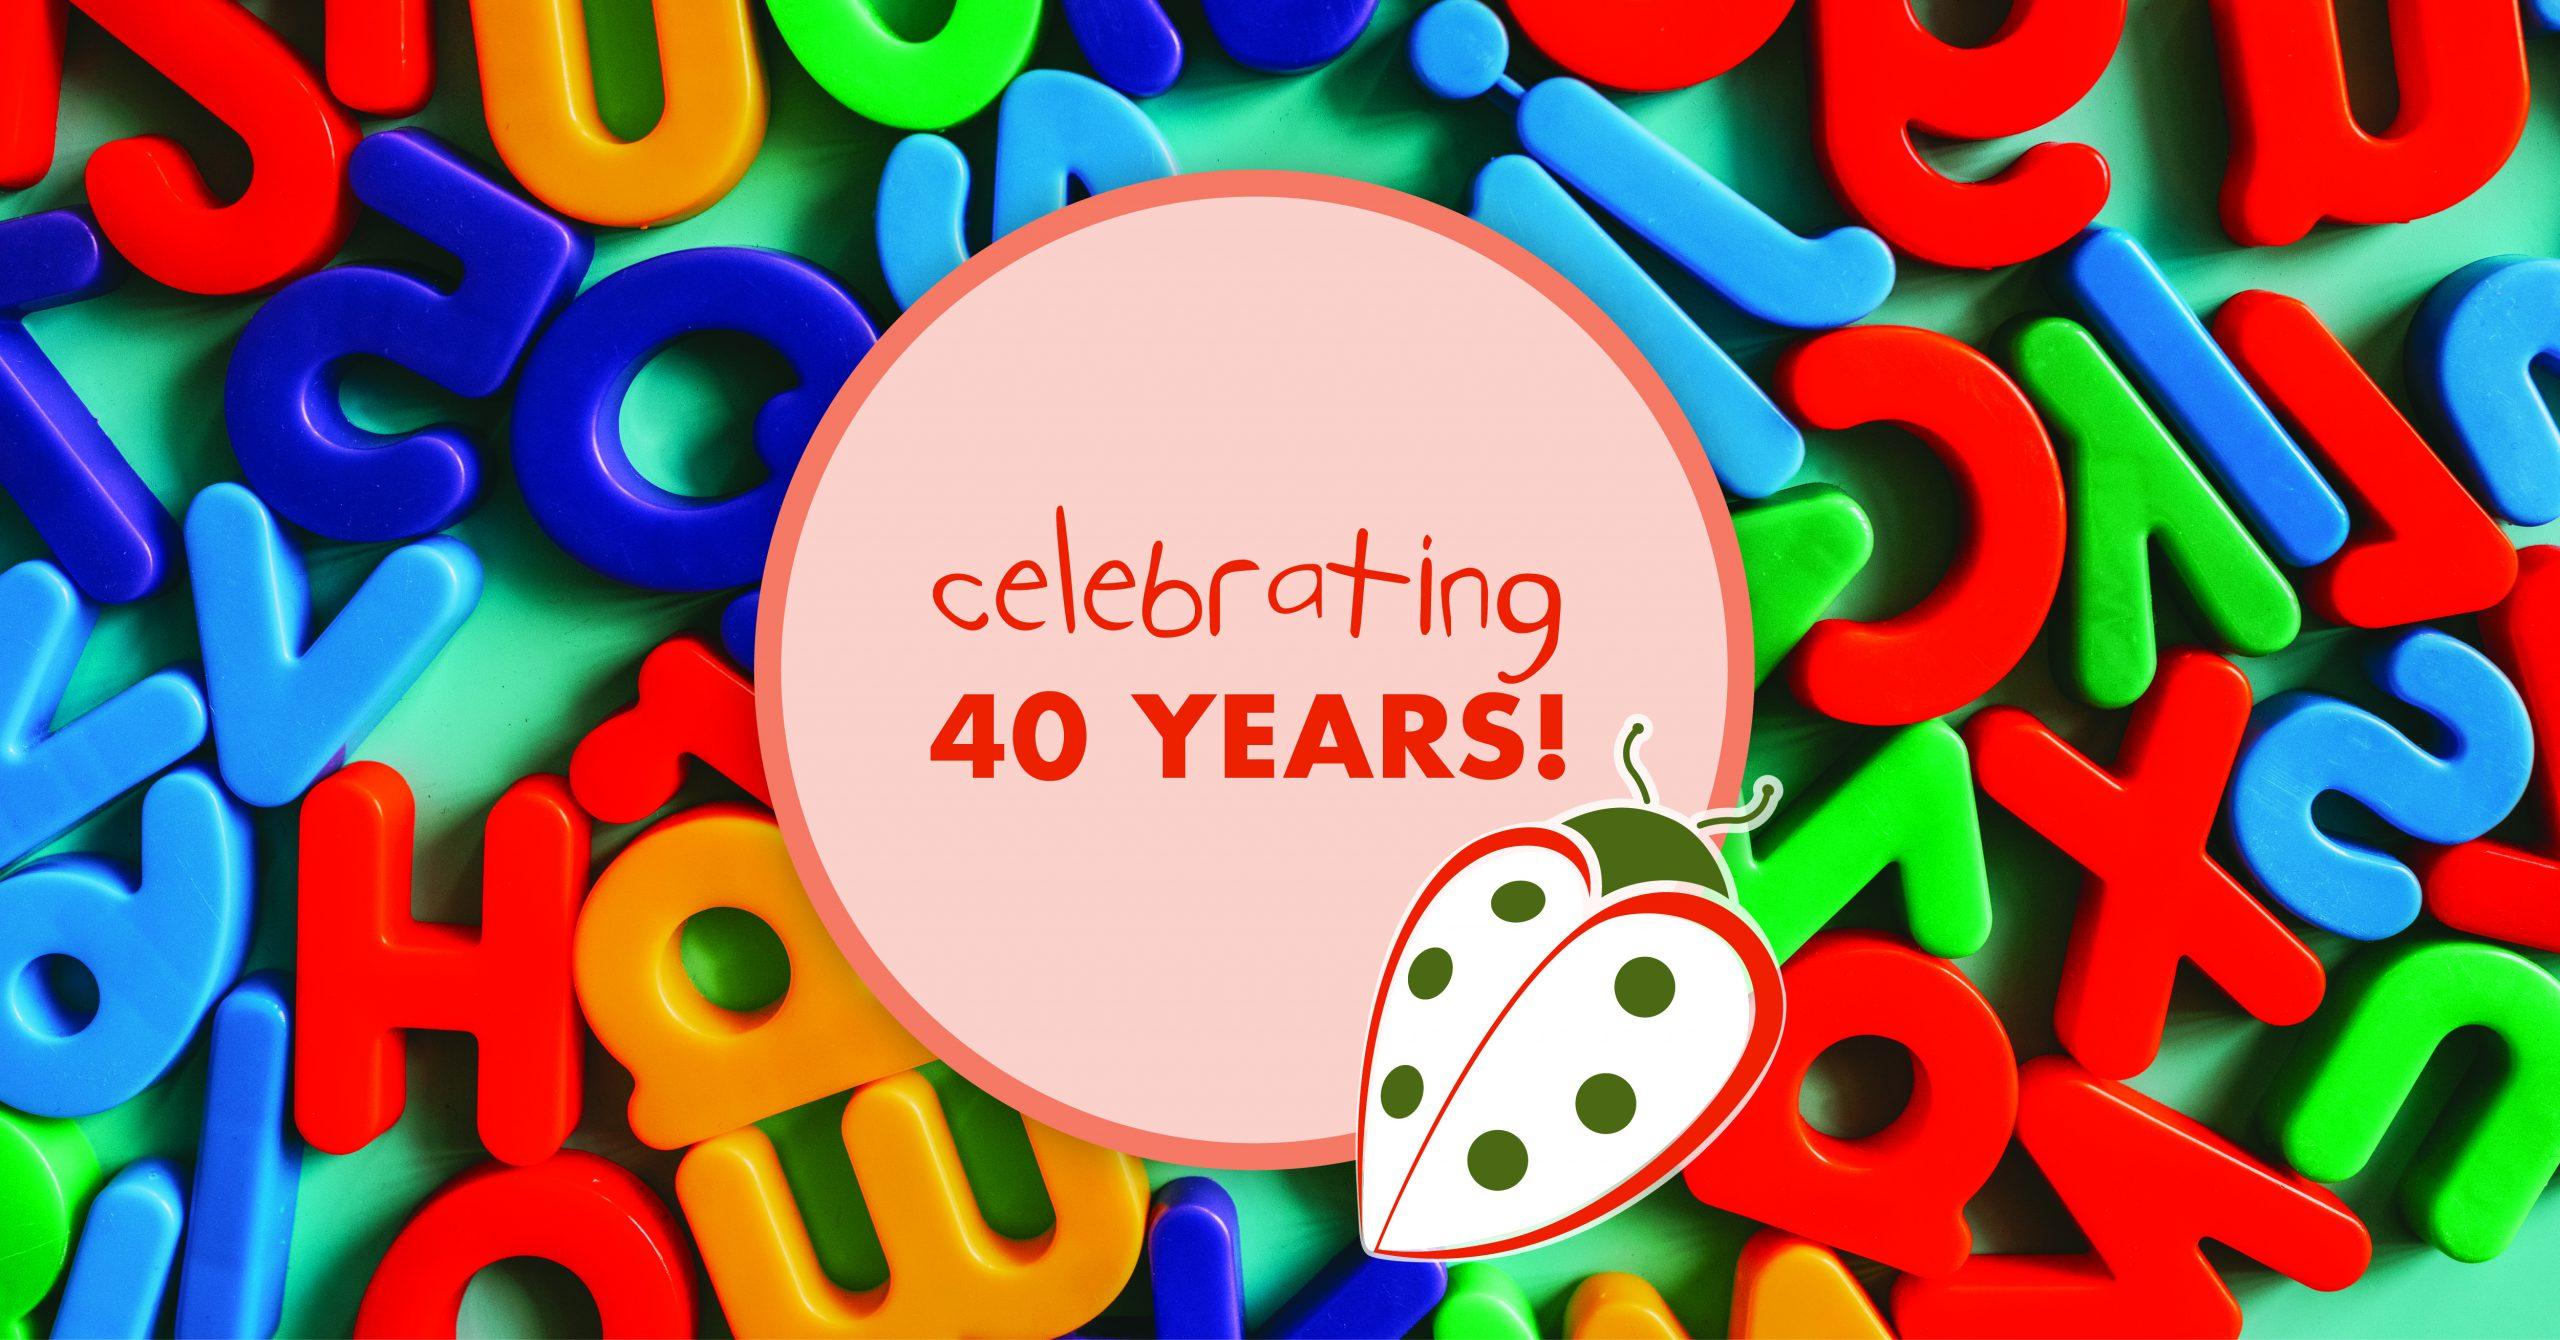 Picture representing Ladybug's 40th anniversary.